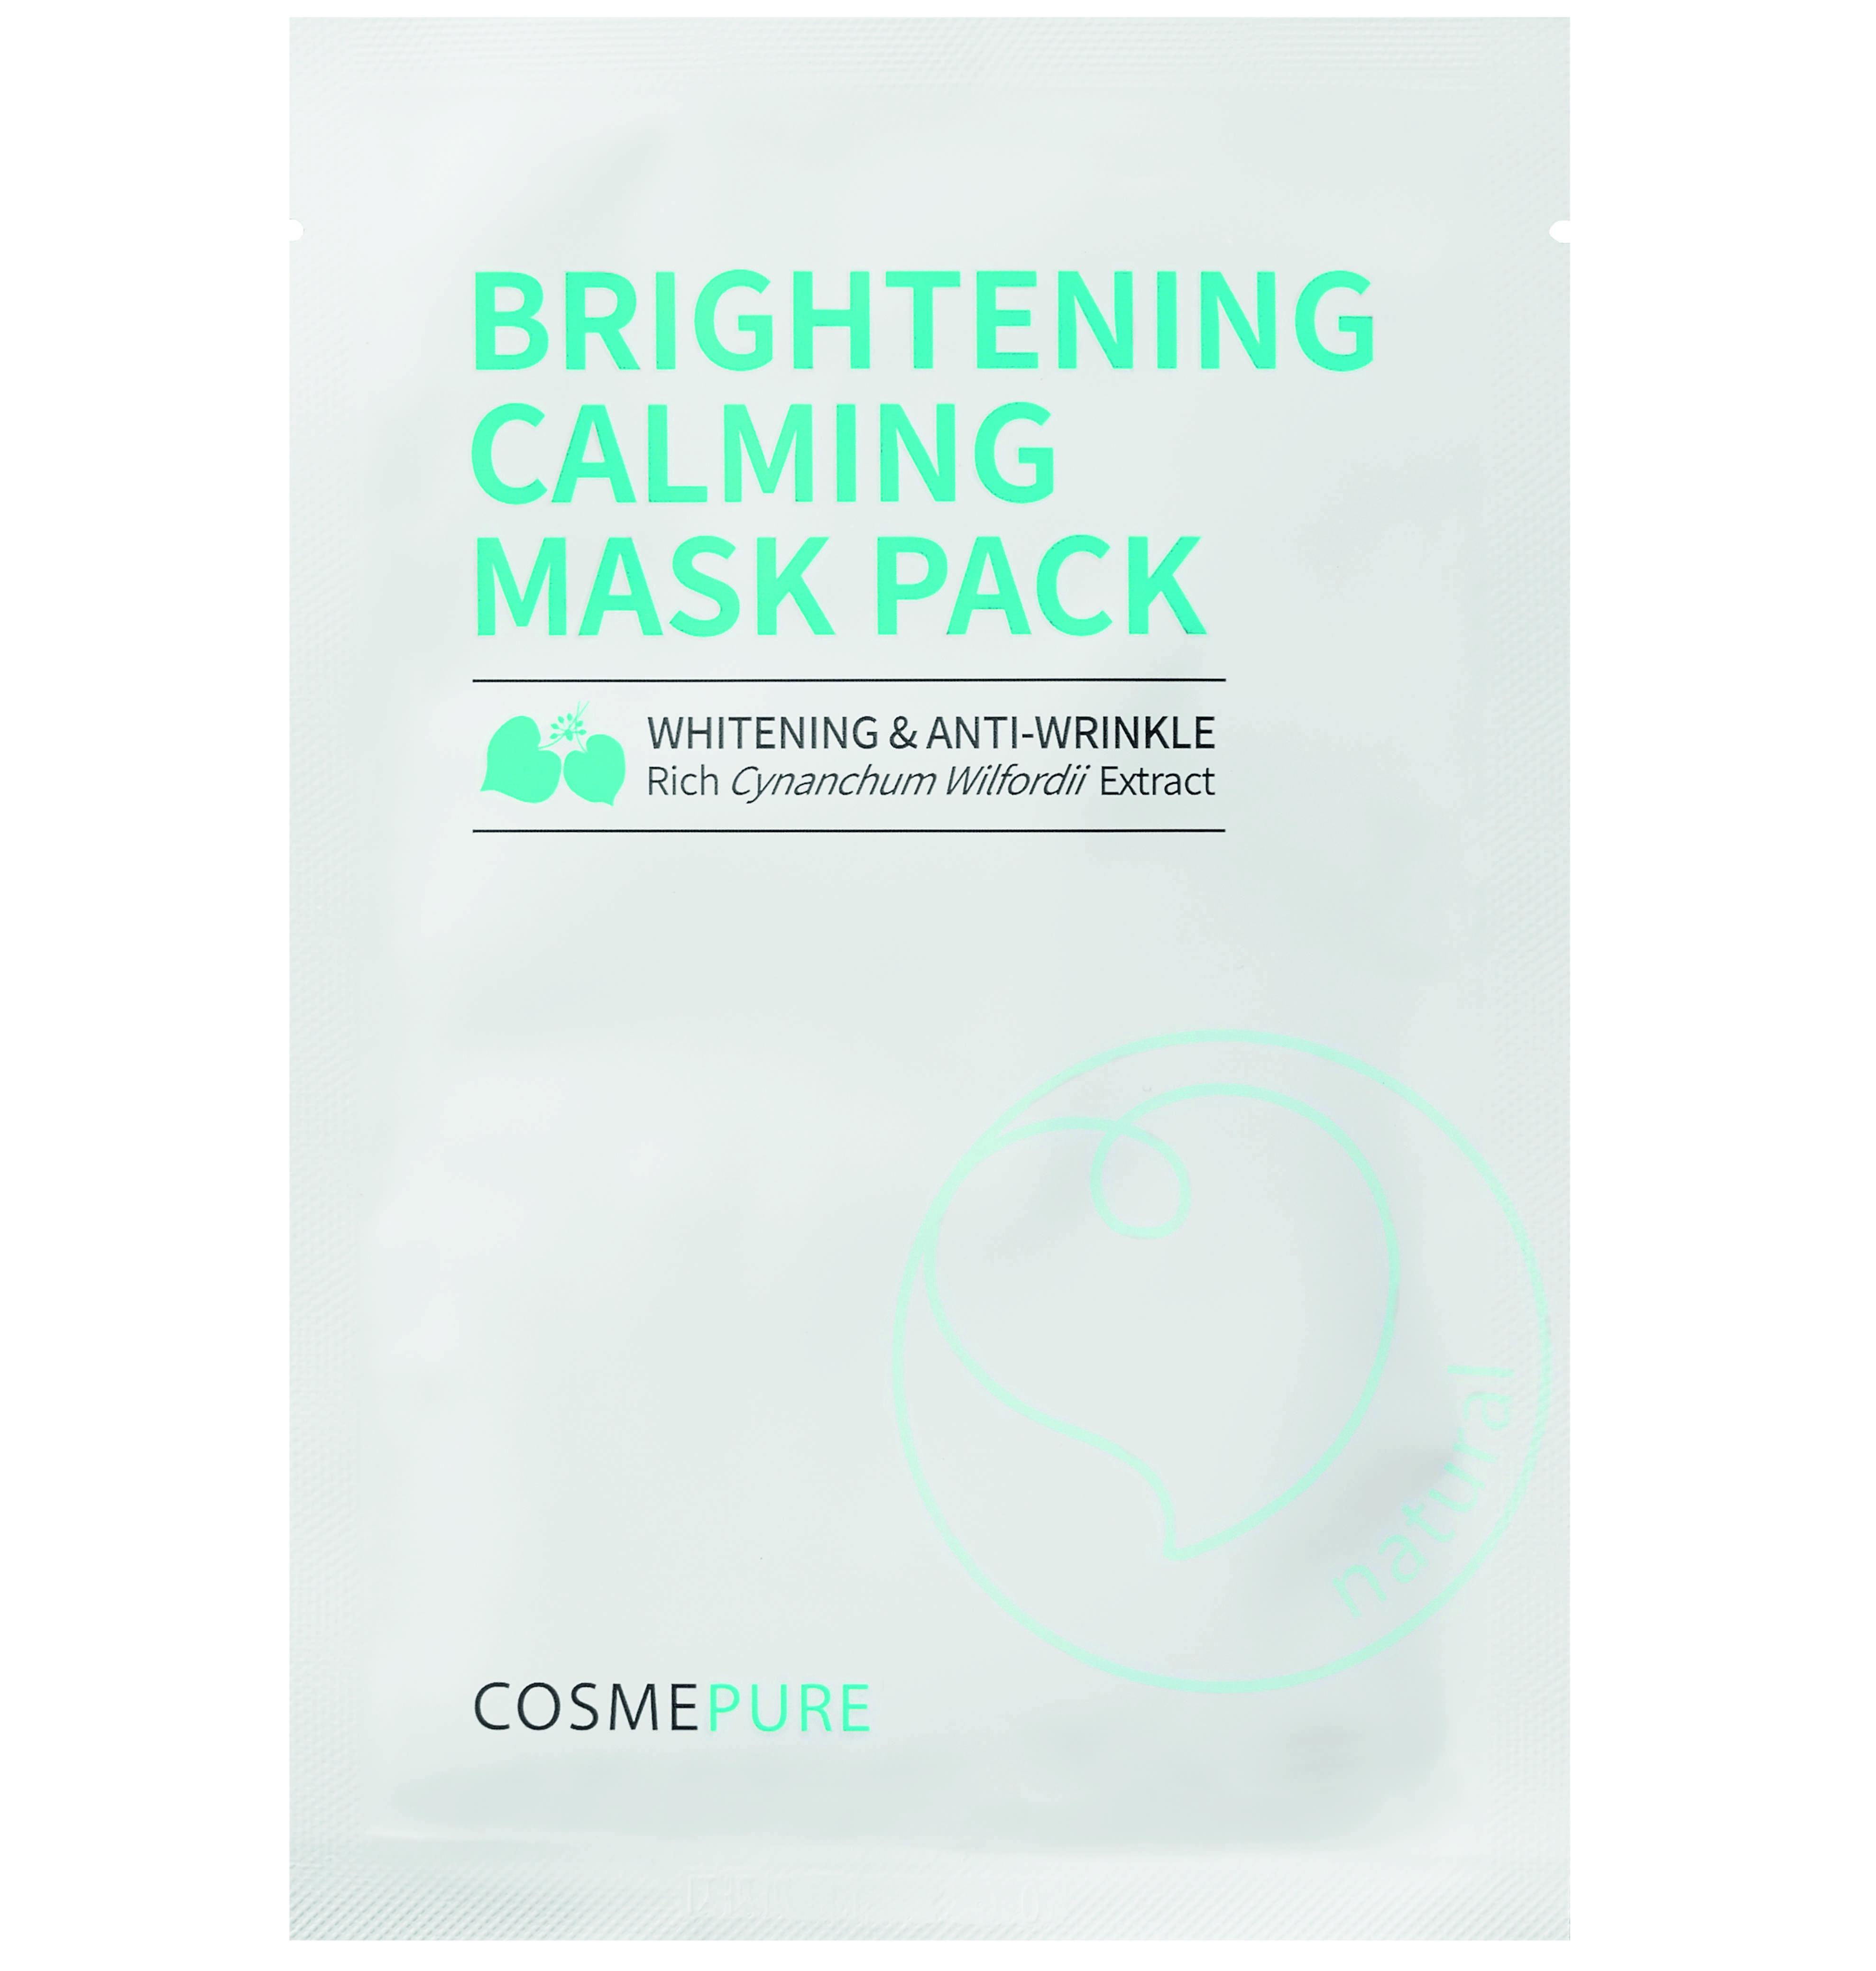 Cosmepure Brightening Calming Mask